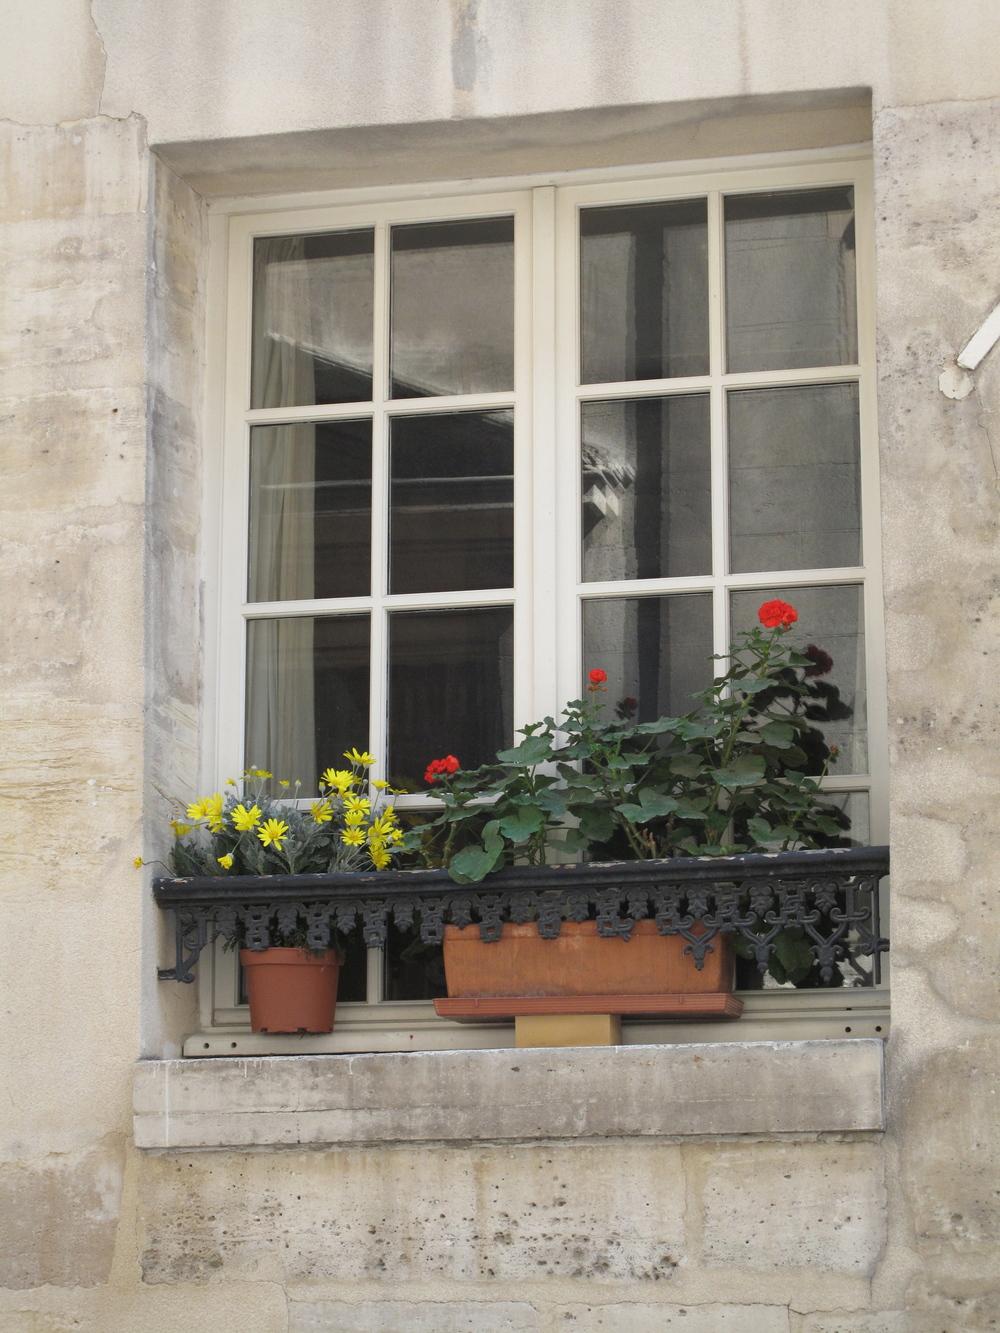 Geranium window planters on the Îles of Paris